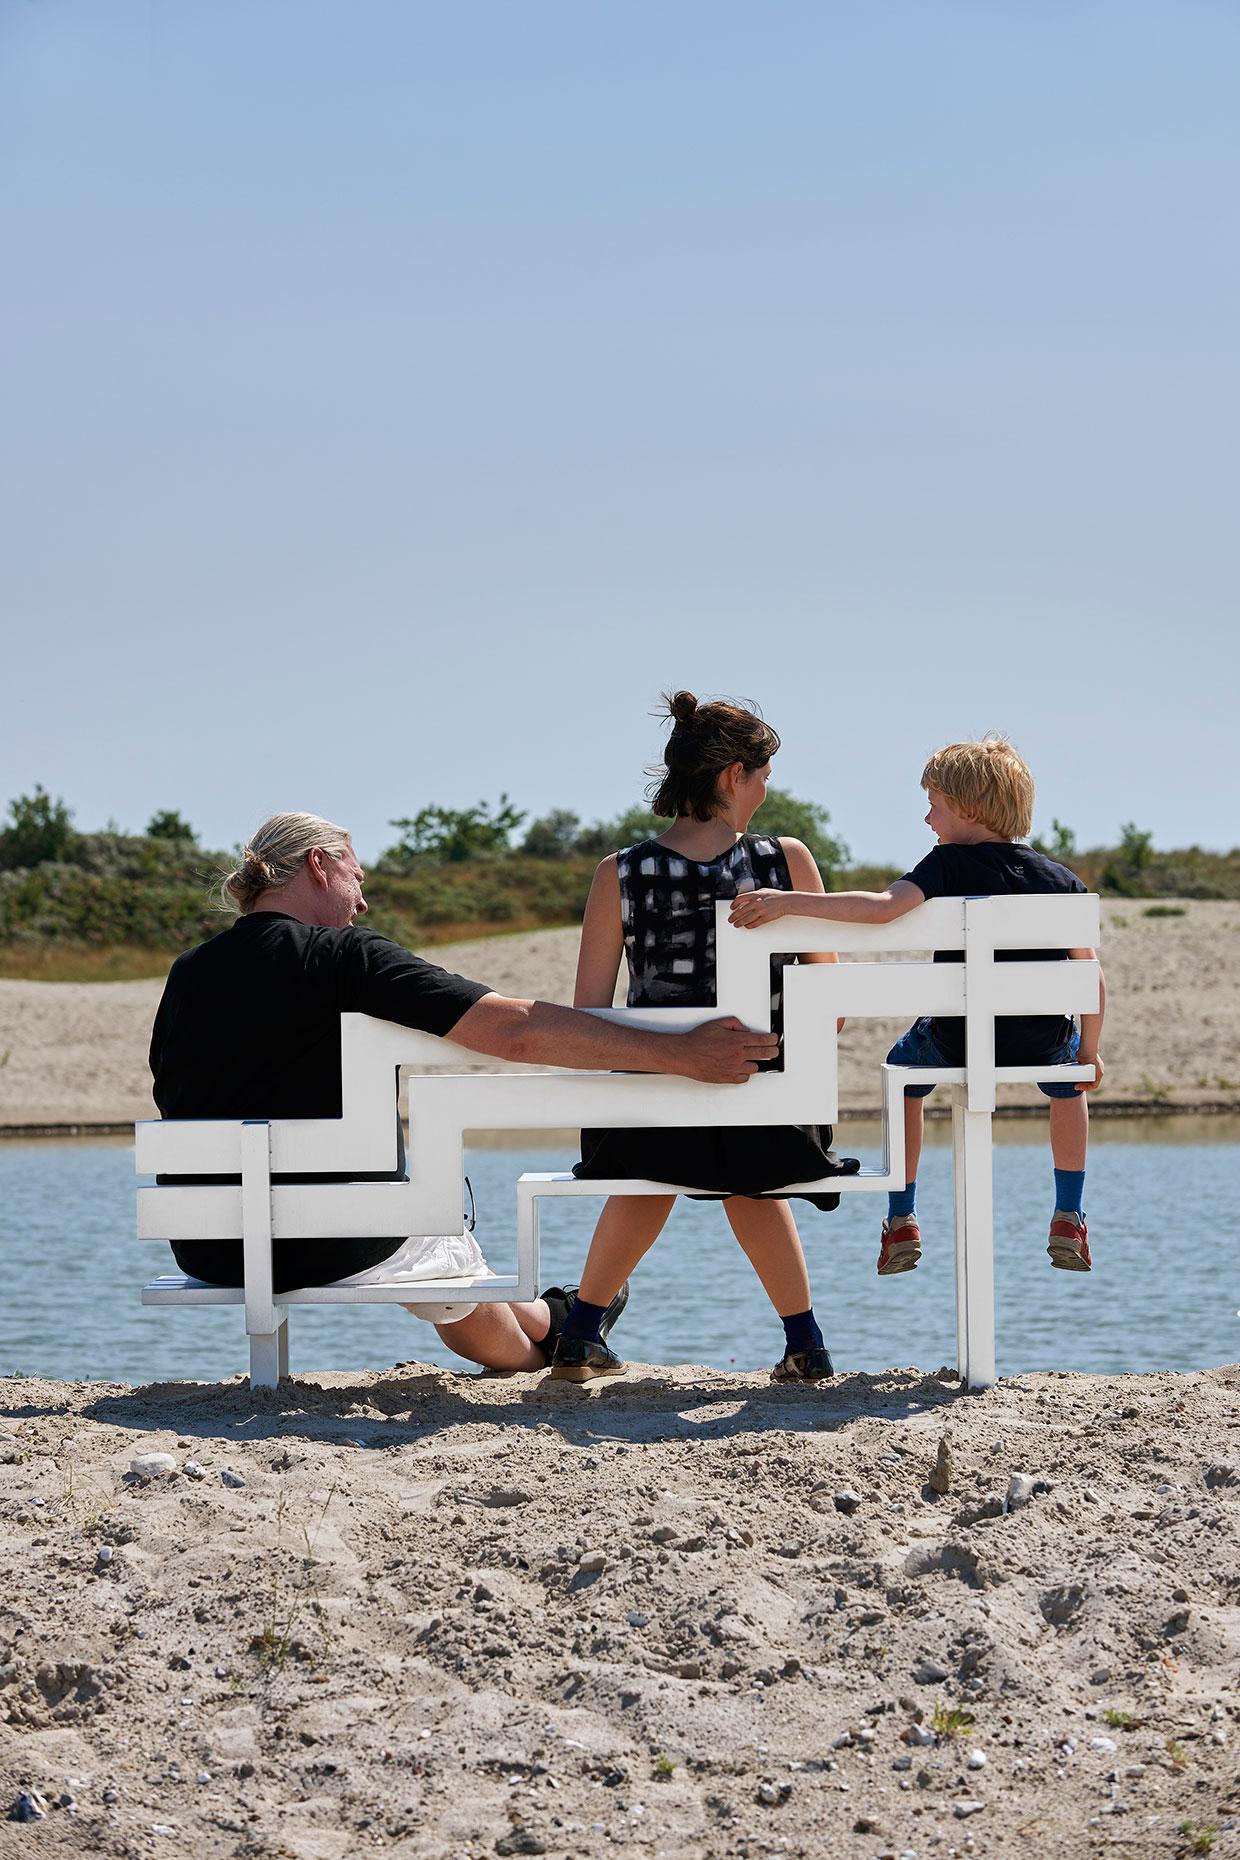 Jeppe Hein, Modified Social Bench U, 2008. ARKEN Collection. Photo: Torben Petersen